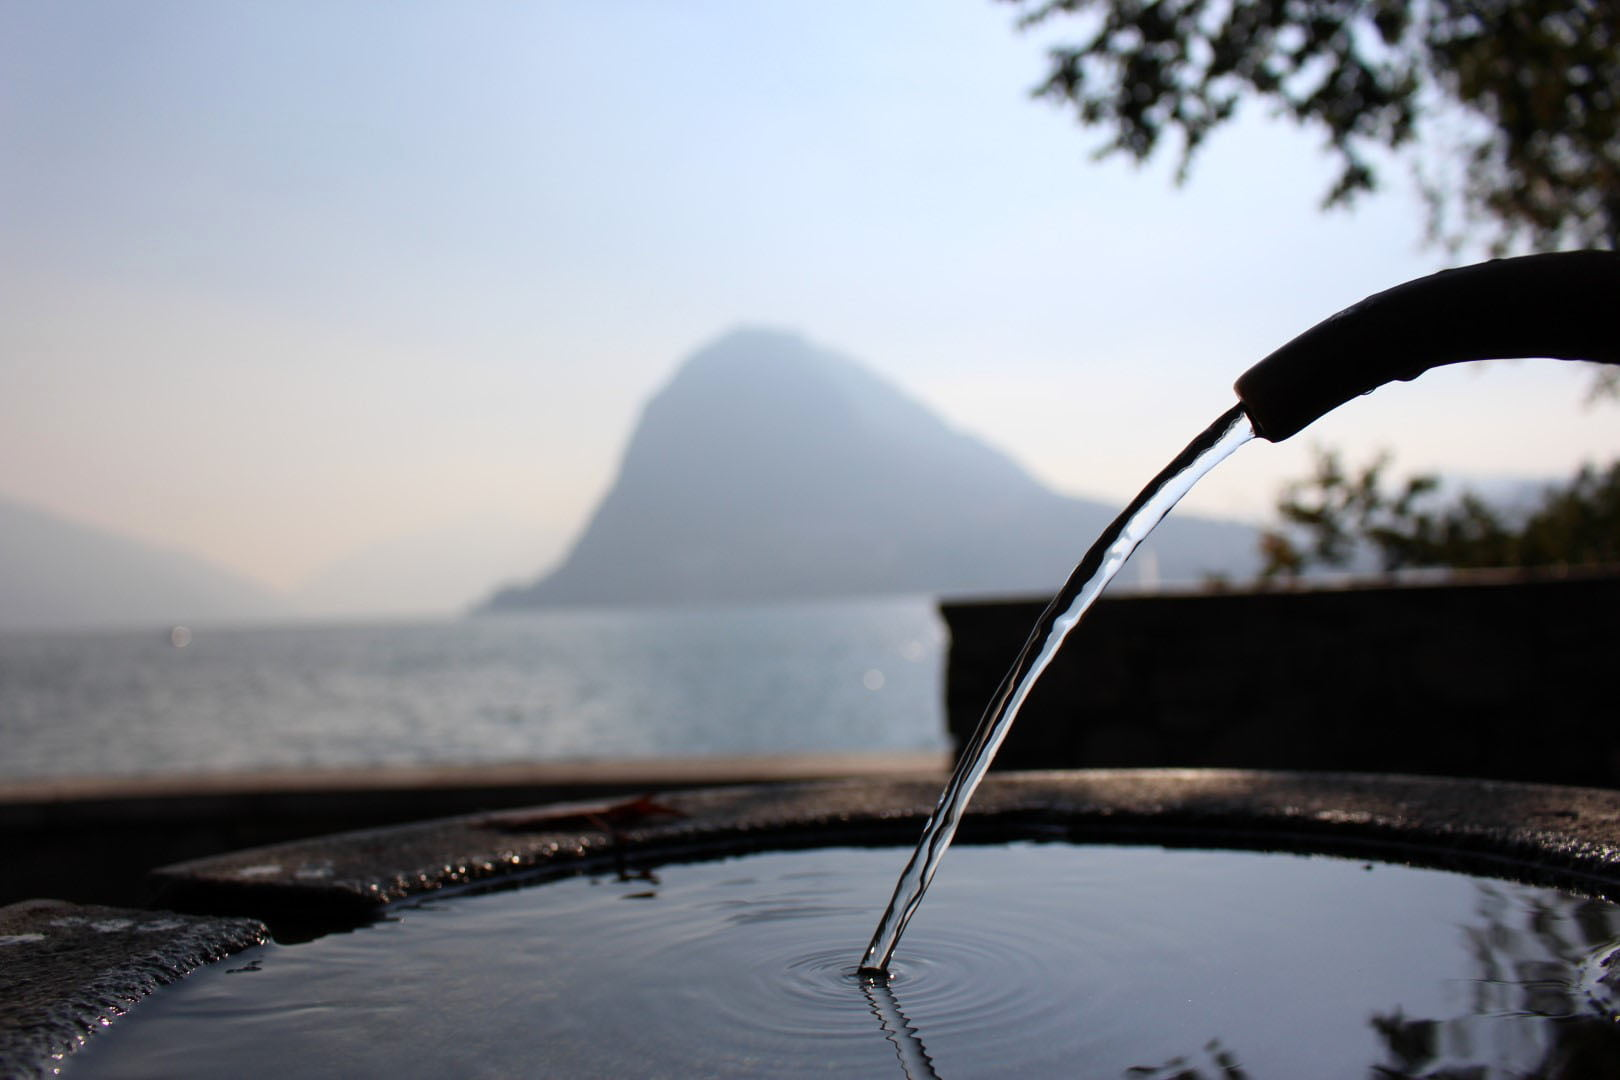 Svajcarska_Lugano_Izlet_Evropski_gradovi_Jezero_Metropole_Last_minute_povoljno